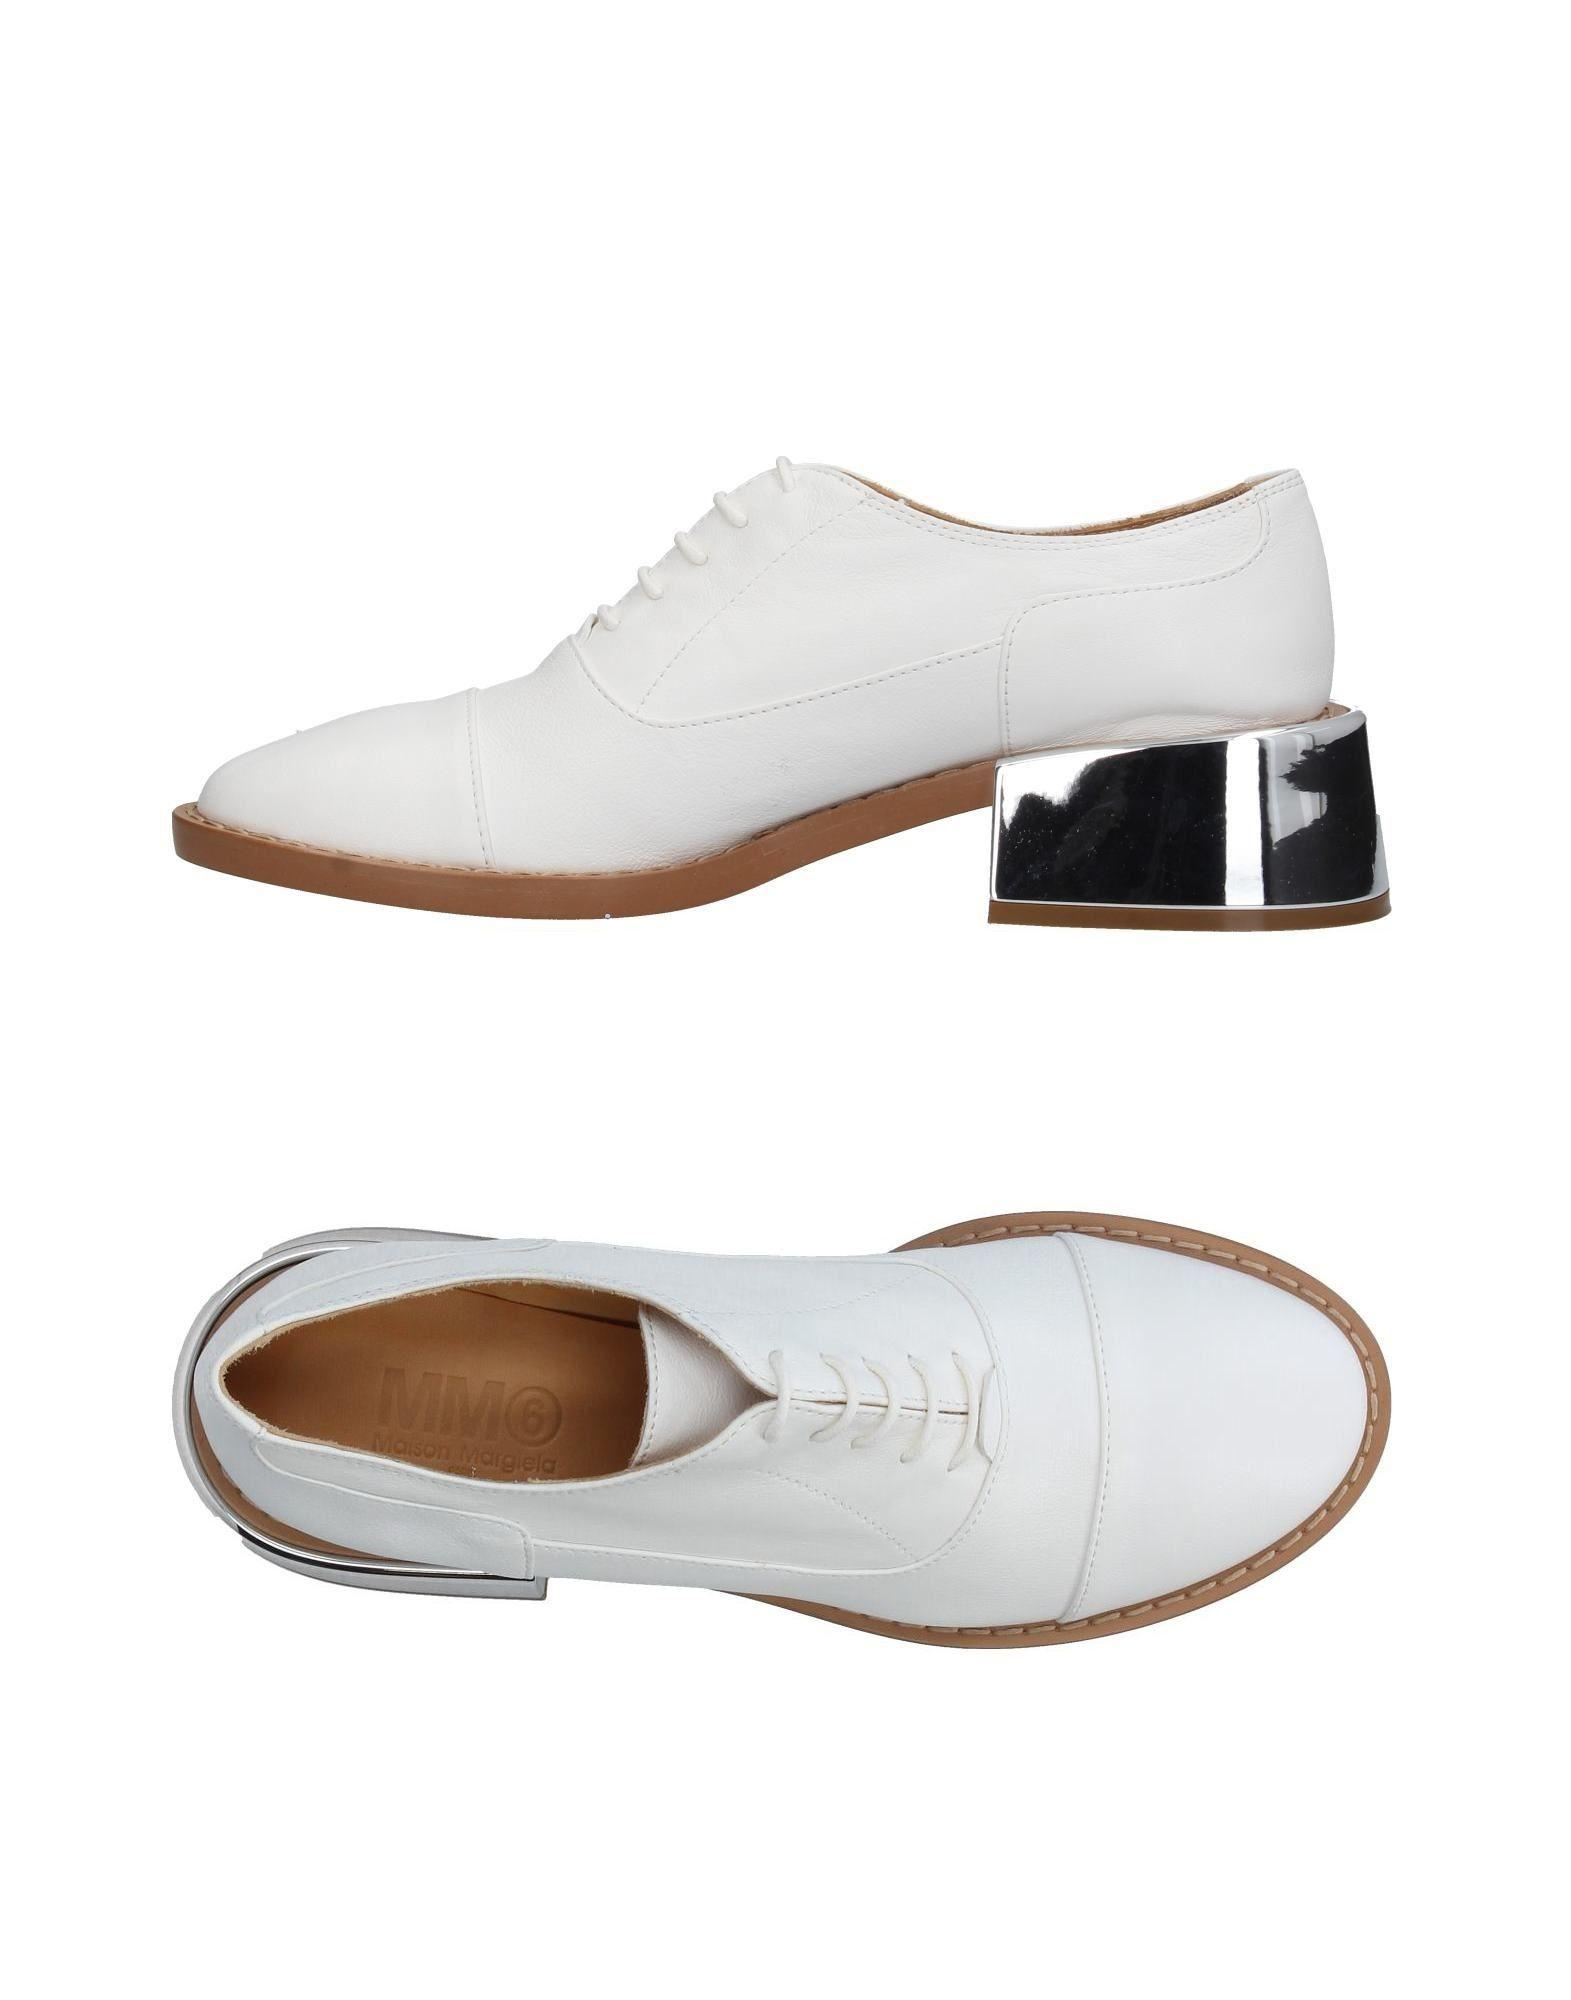 pointed toe lace-up shoes - White Maison Martin Margiela NU08tI